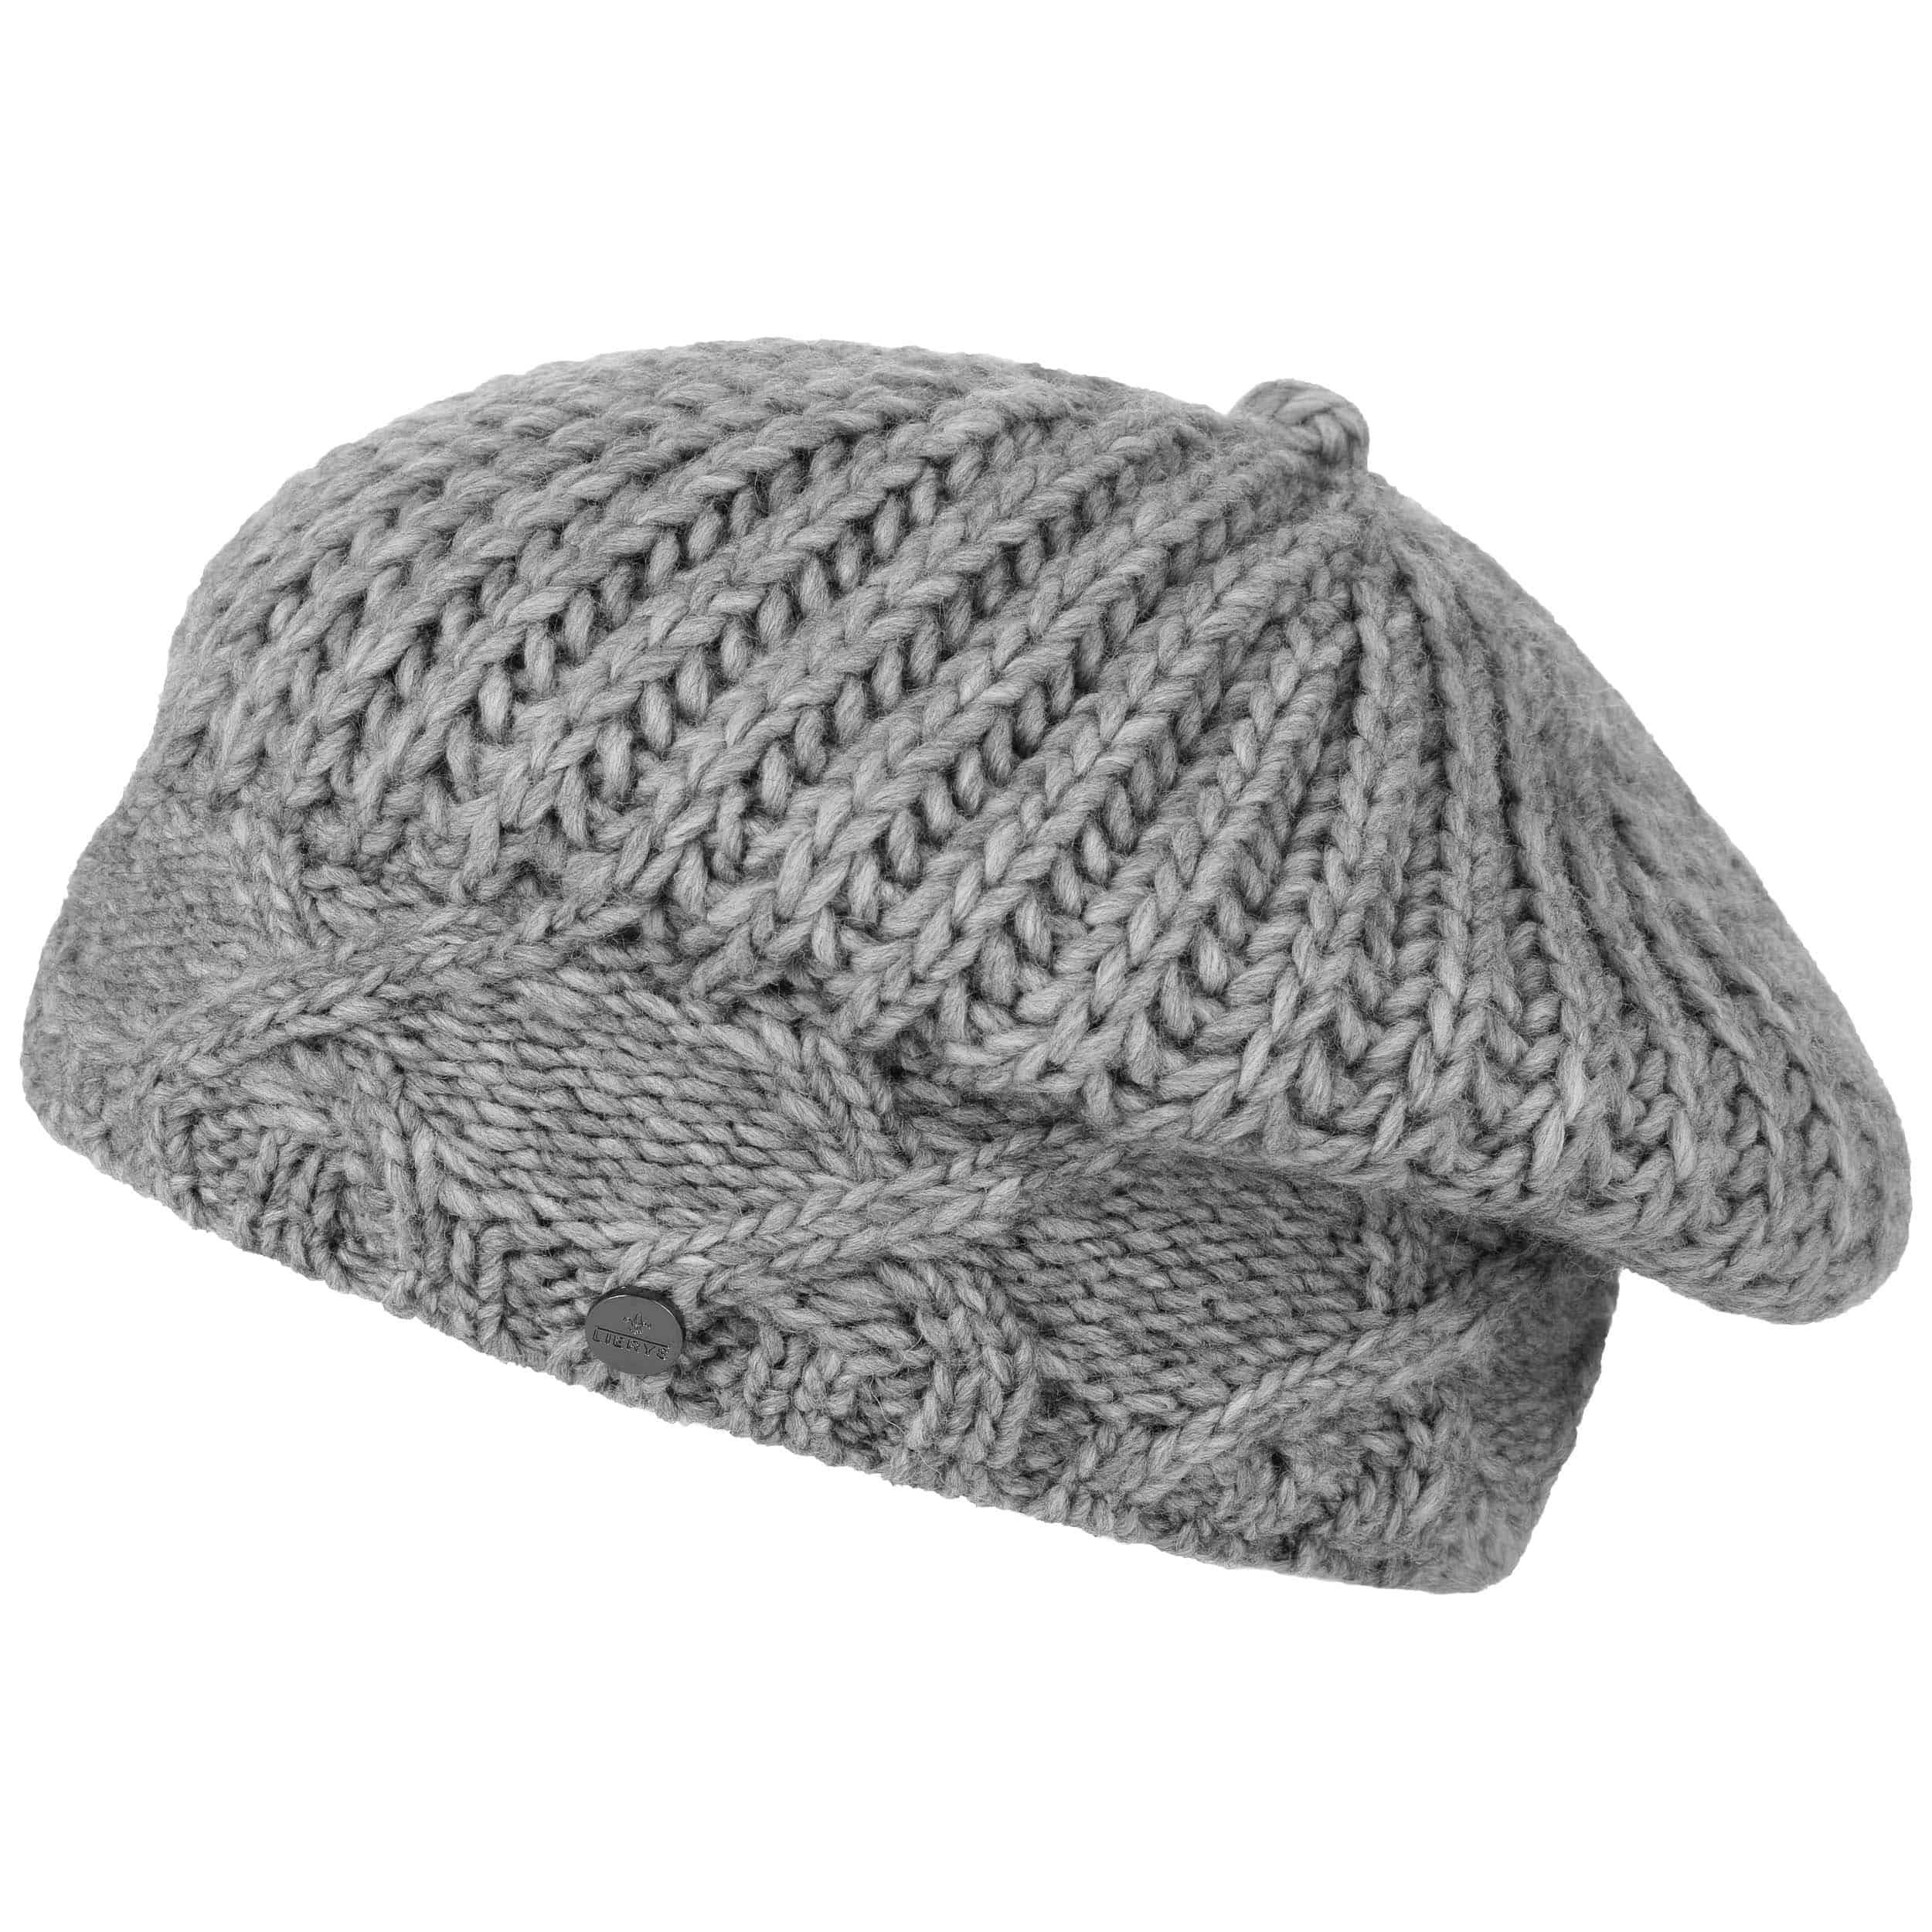 Boina de Punto Jil by Lierys - Gorros - sombreroshop.es 9663e622e43